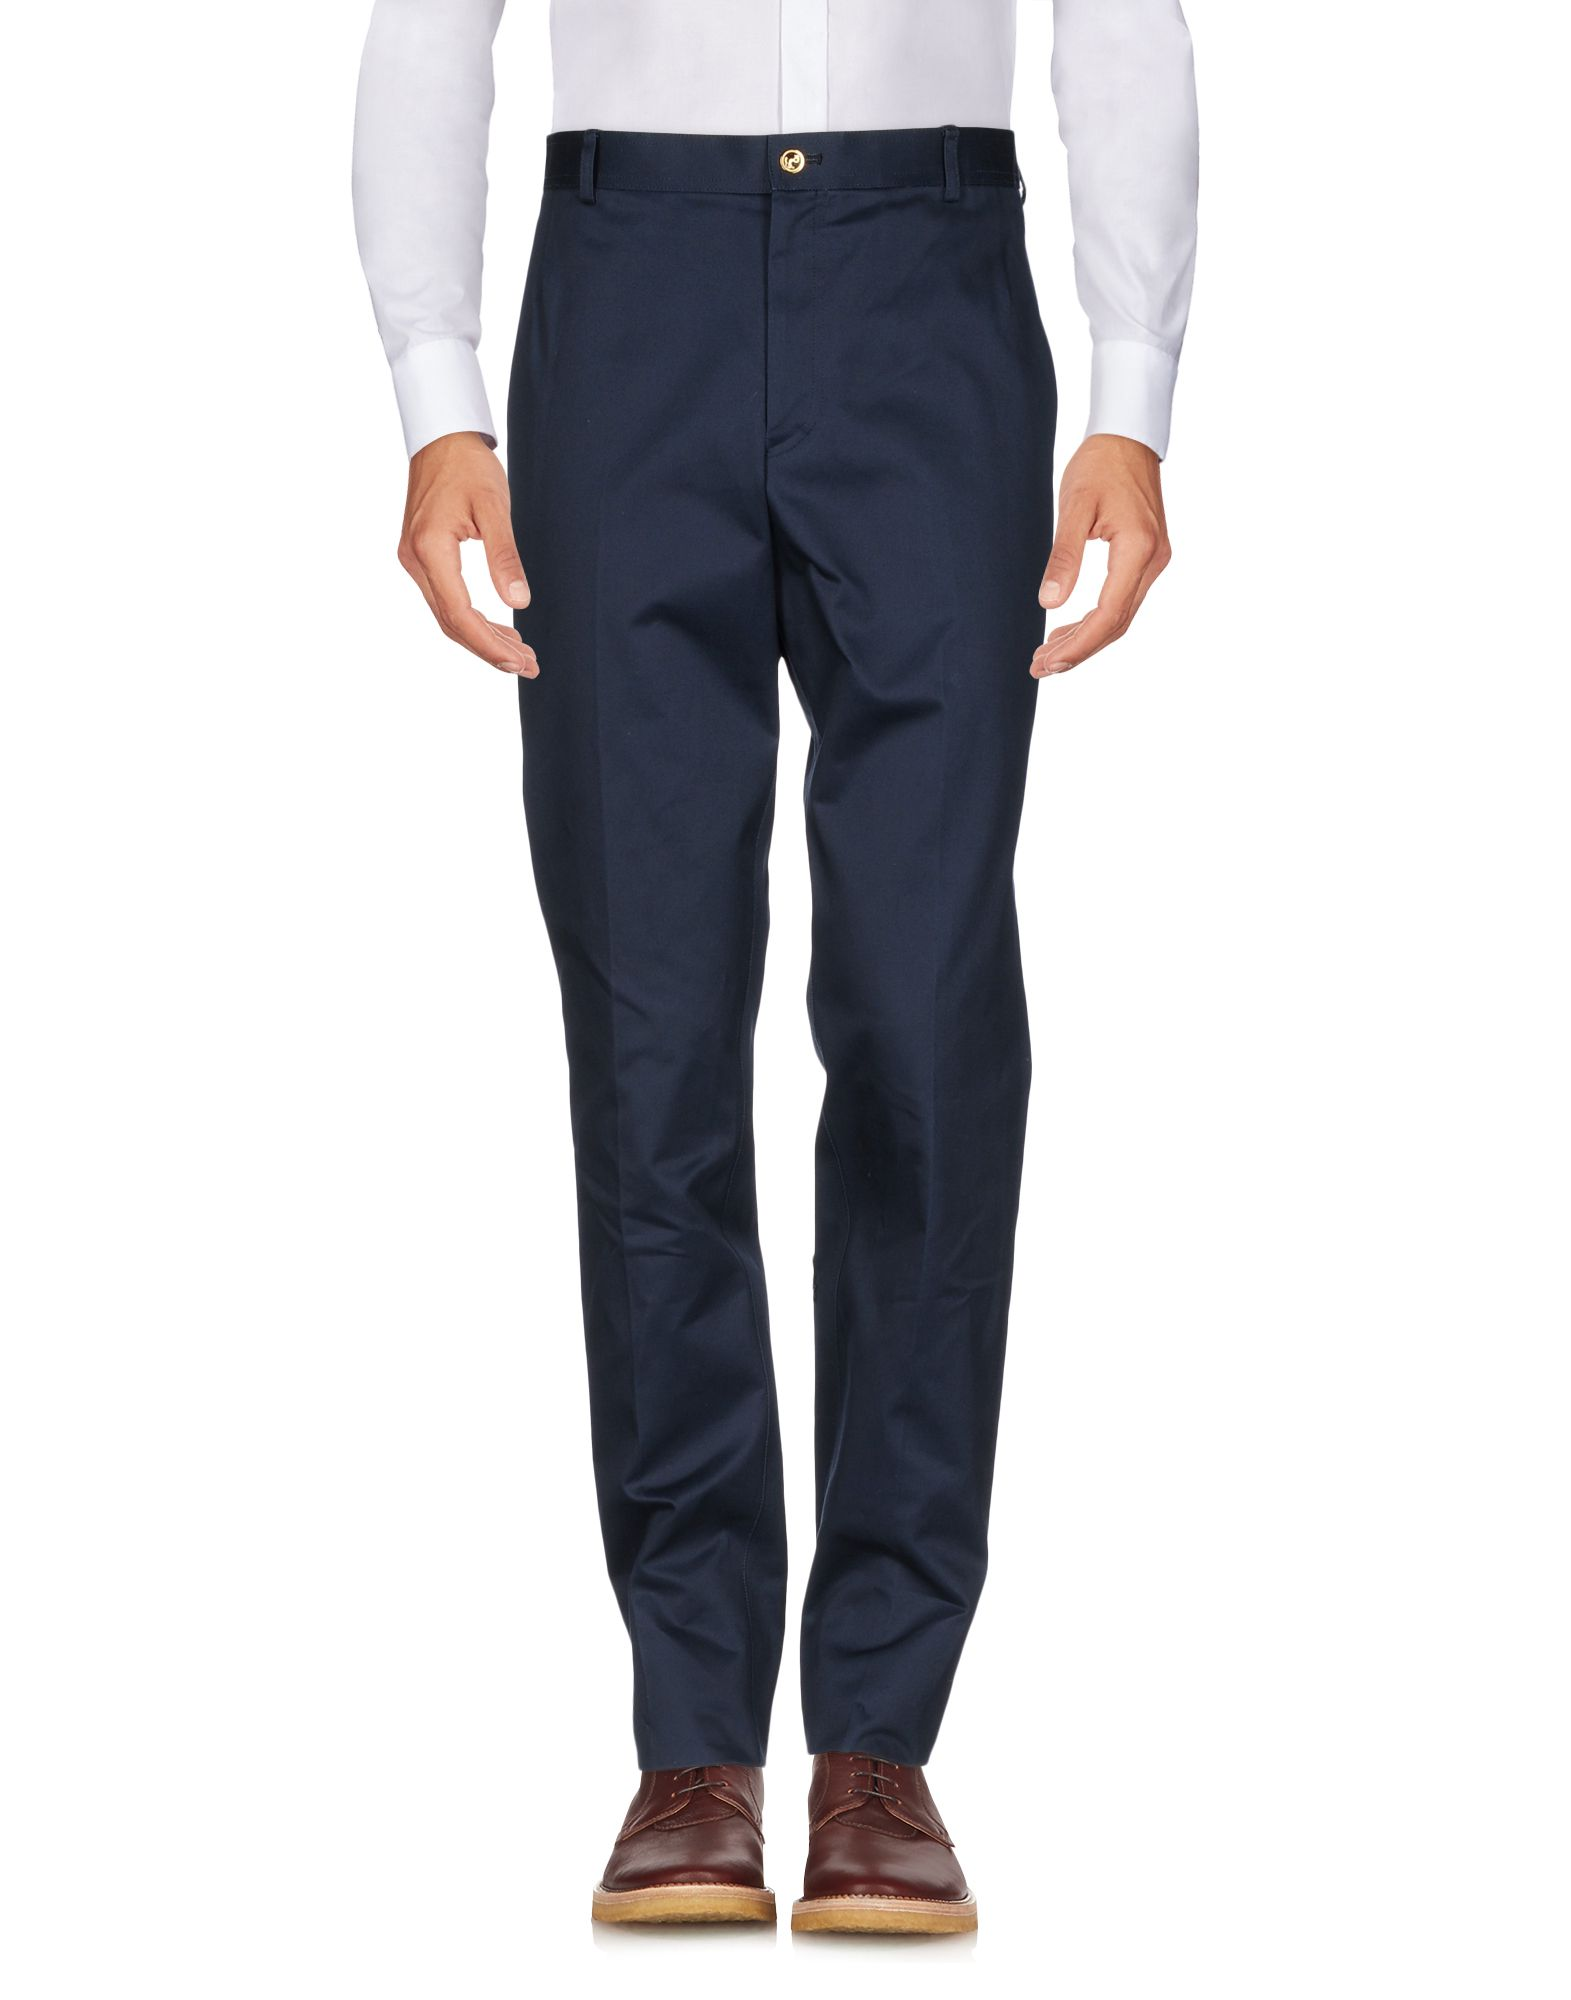 Pantalone Thom Browne Uomo - Acquista online su